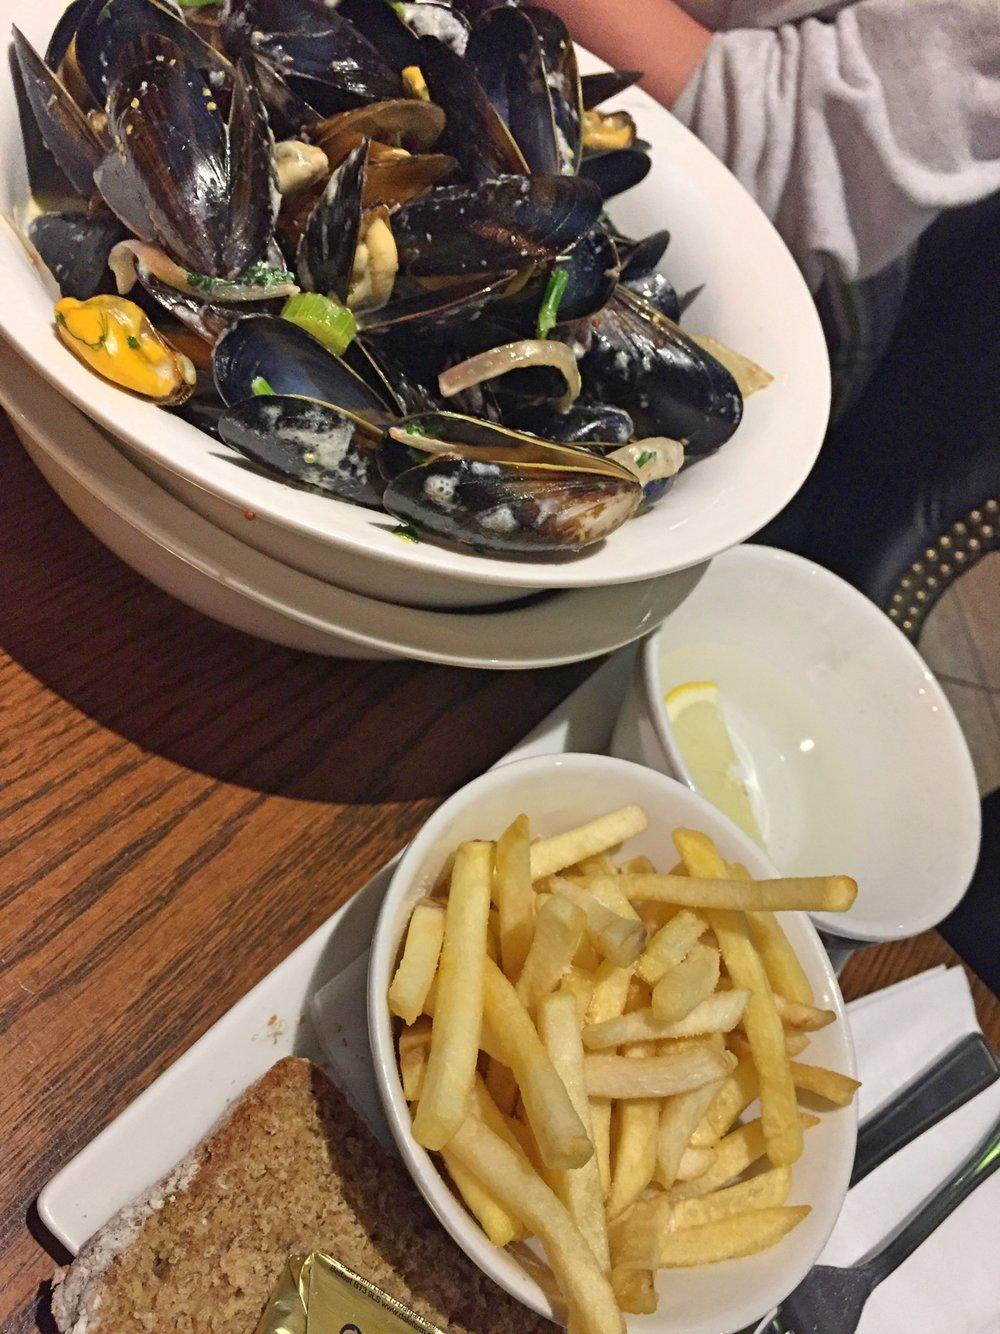 fullerton_arms_pub_guesthouse_menu_ballintoy_northern_ireland_niexplorer_ni_explorer (7).jpg